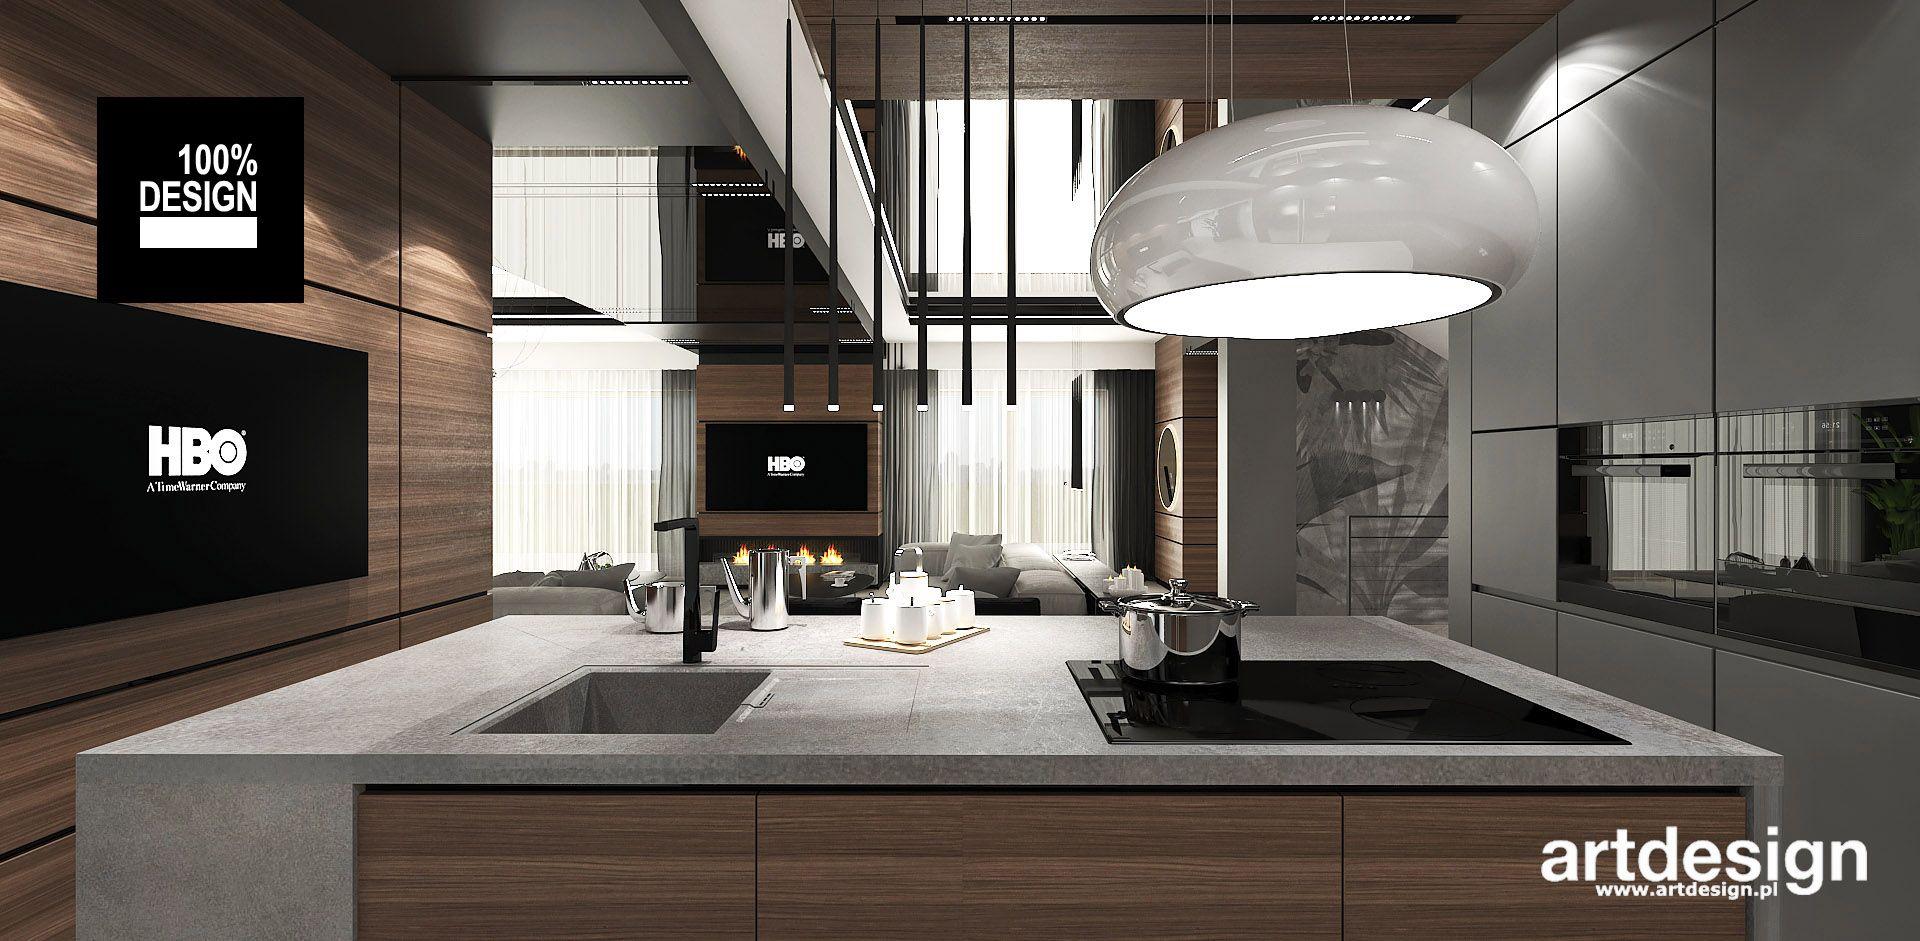 Nowoczesna Kuchnia Z Wyspa Projekt Artdesign Foorni Pl Kuchnia Kitchen Interior Home Homedesign Kuchnia Styln Lighted Bathroom Mirror Home Decor